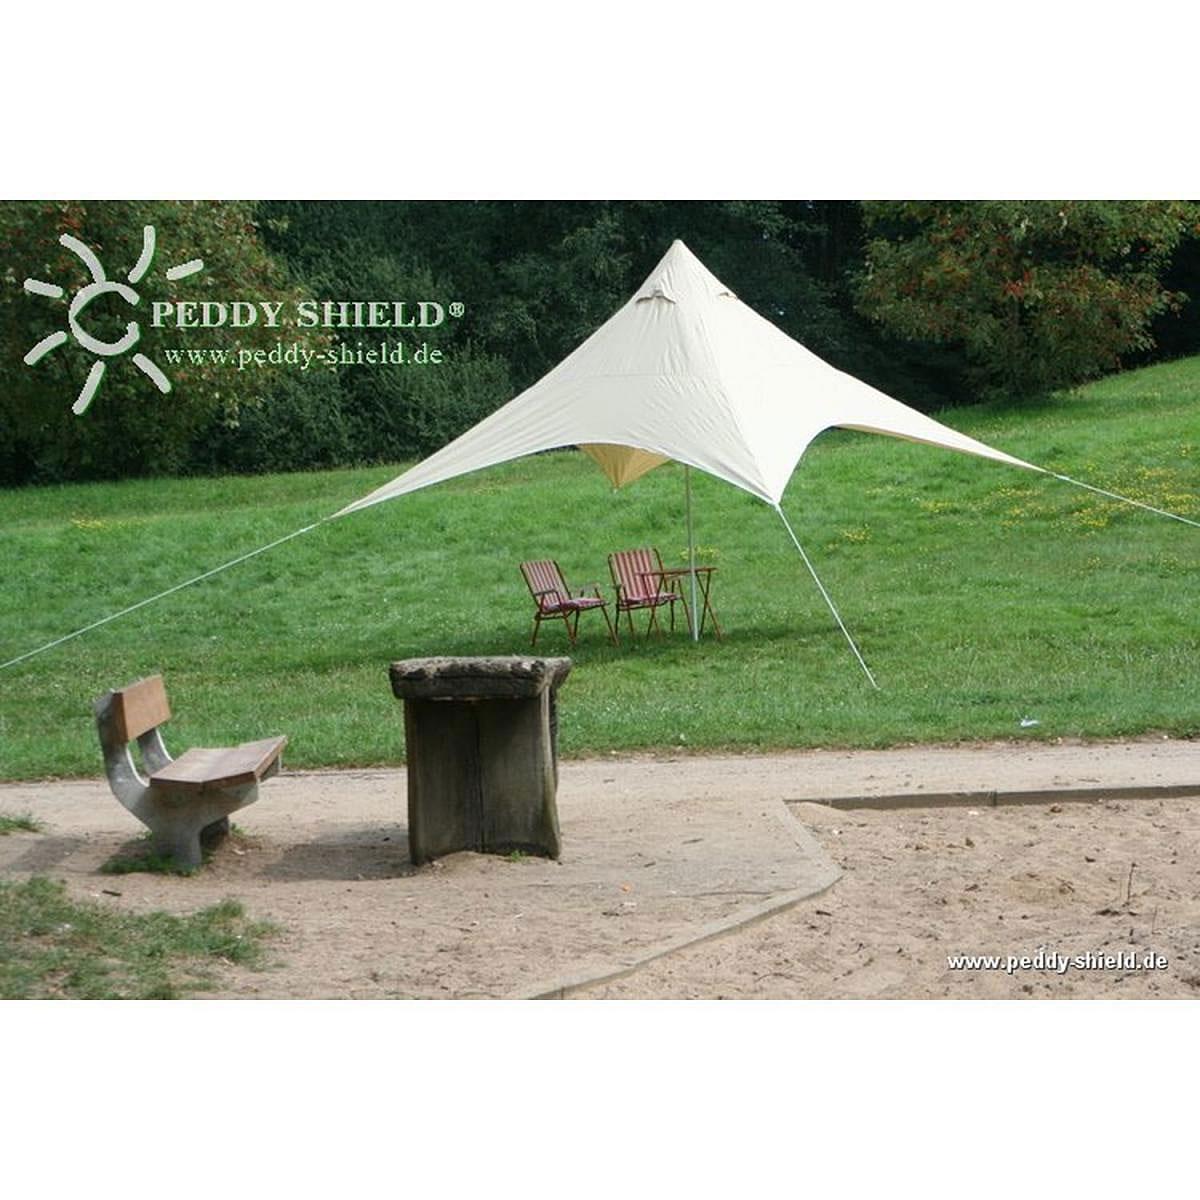 Floracord Camping Pyramiden Sonnensegel Sand 400 cm x 400 cm